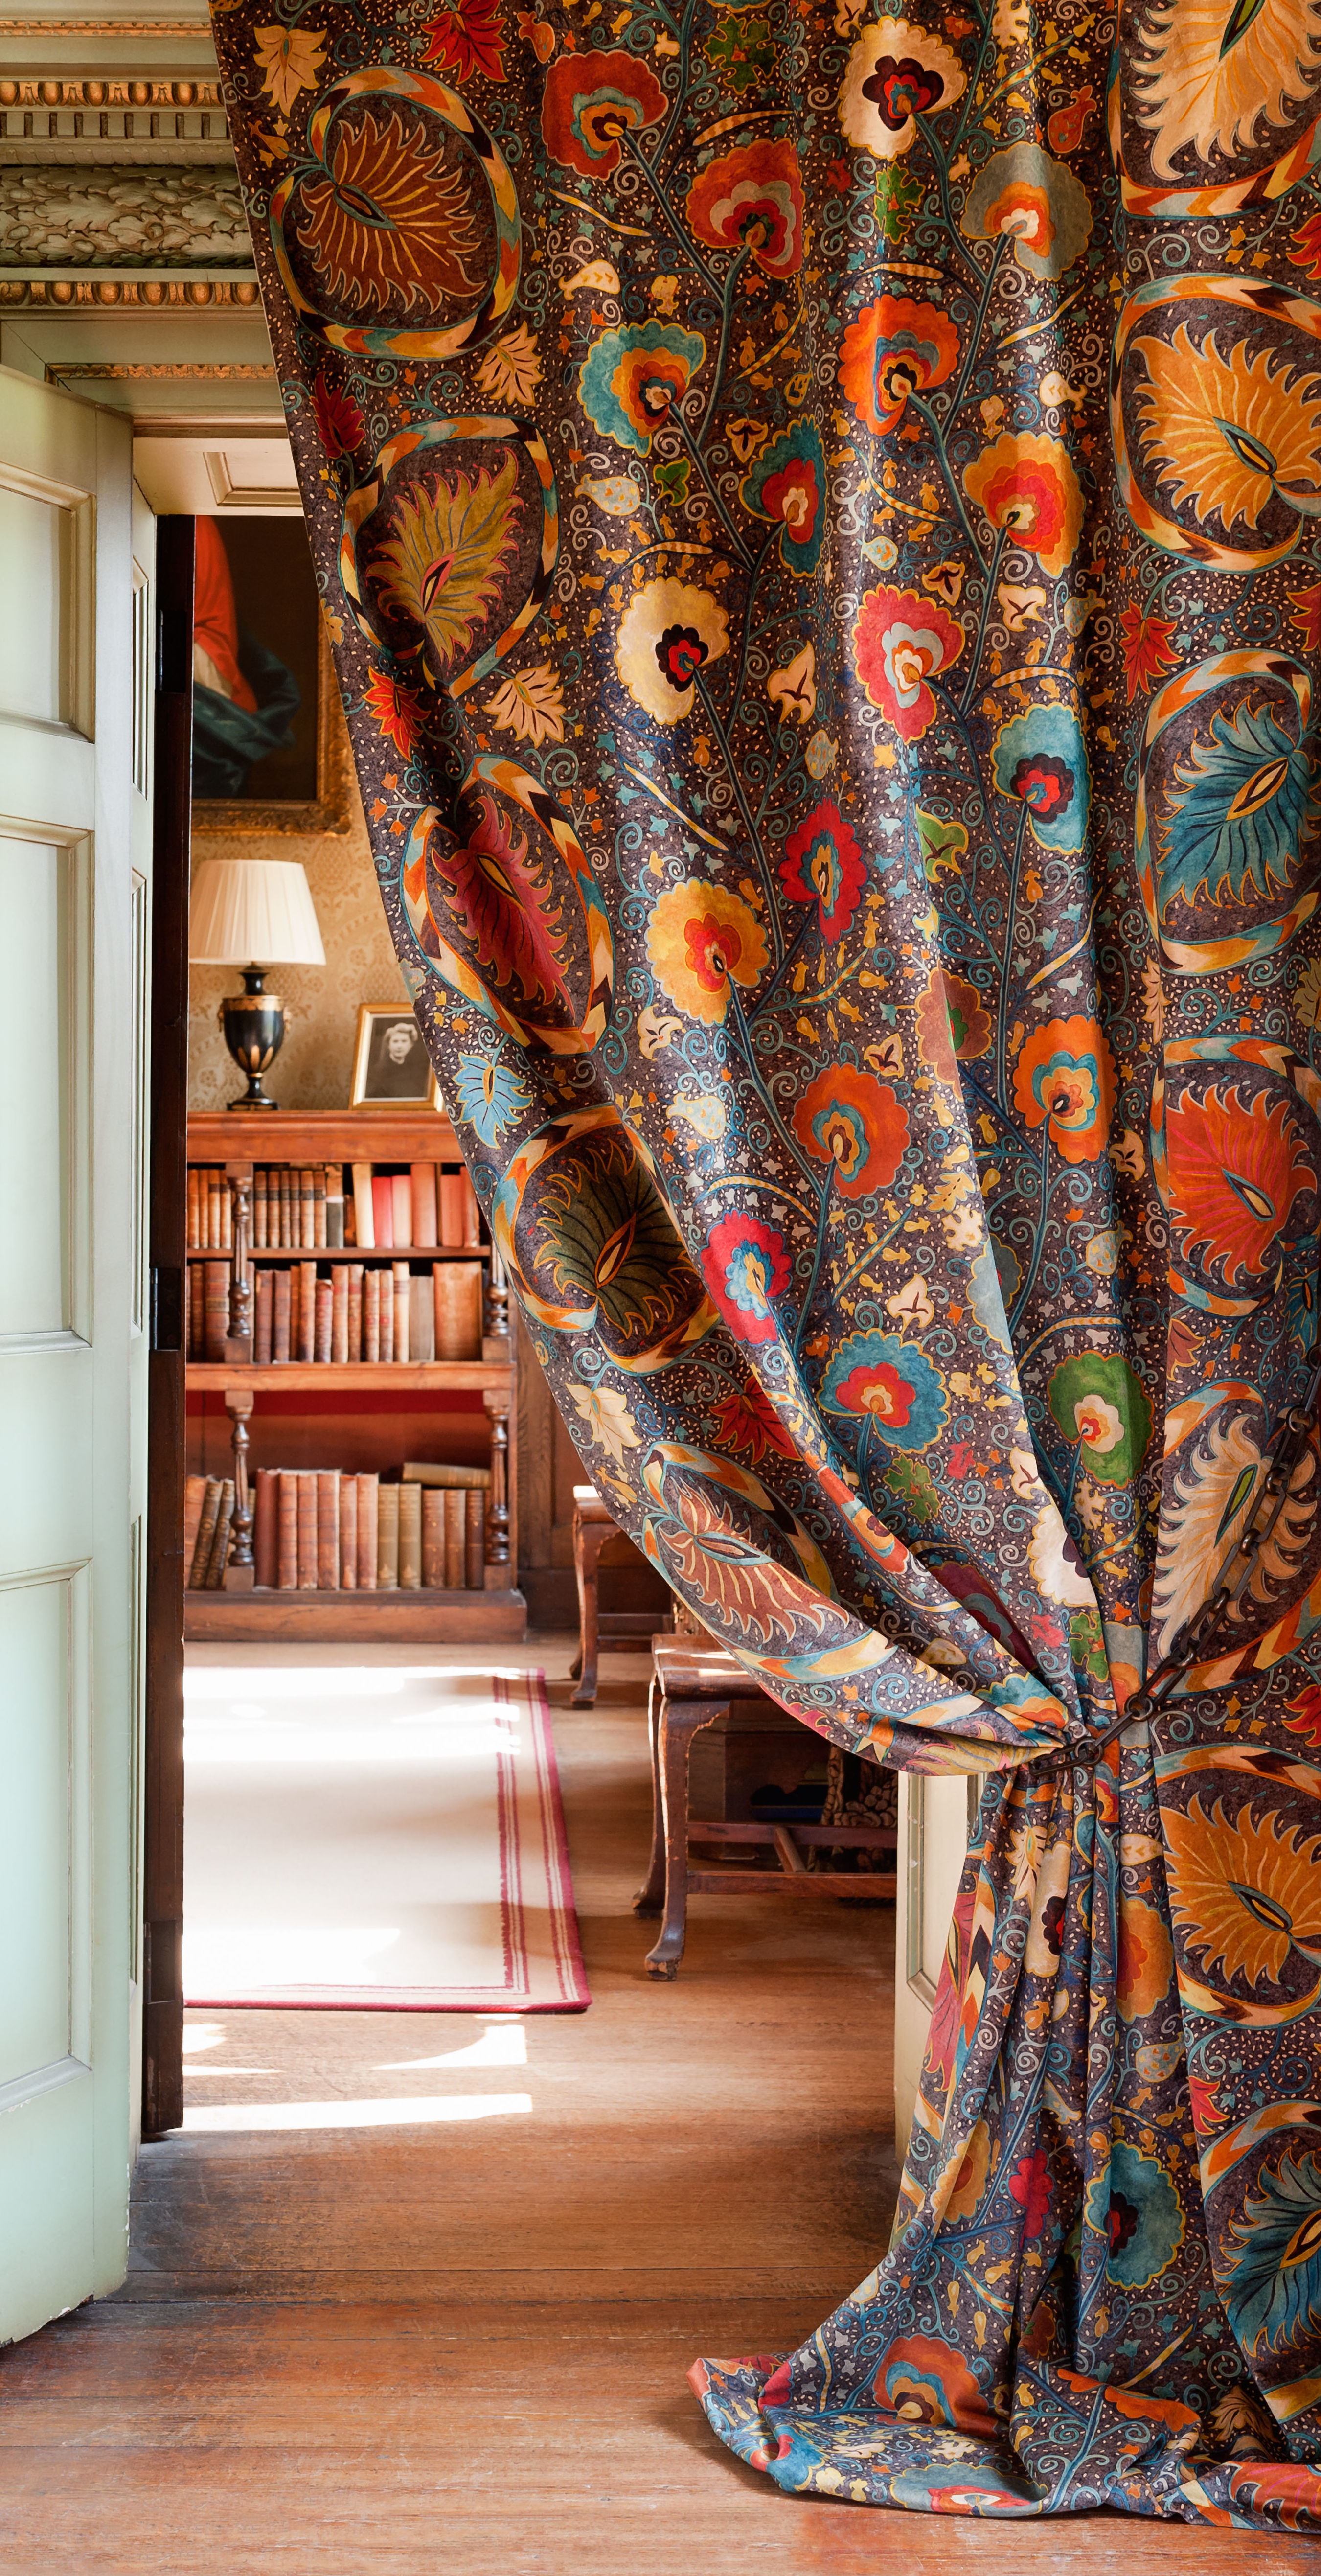 Foto 11 de Decoración textil en Madrid | Diseño Textil